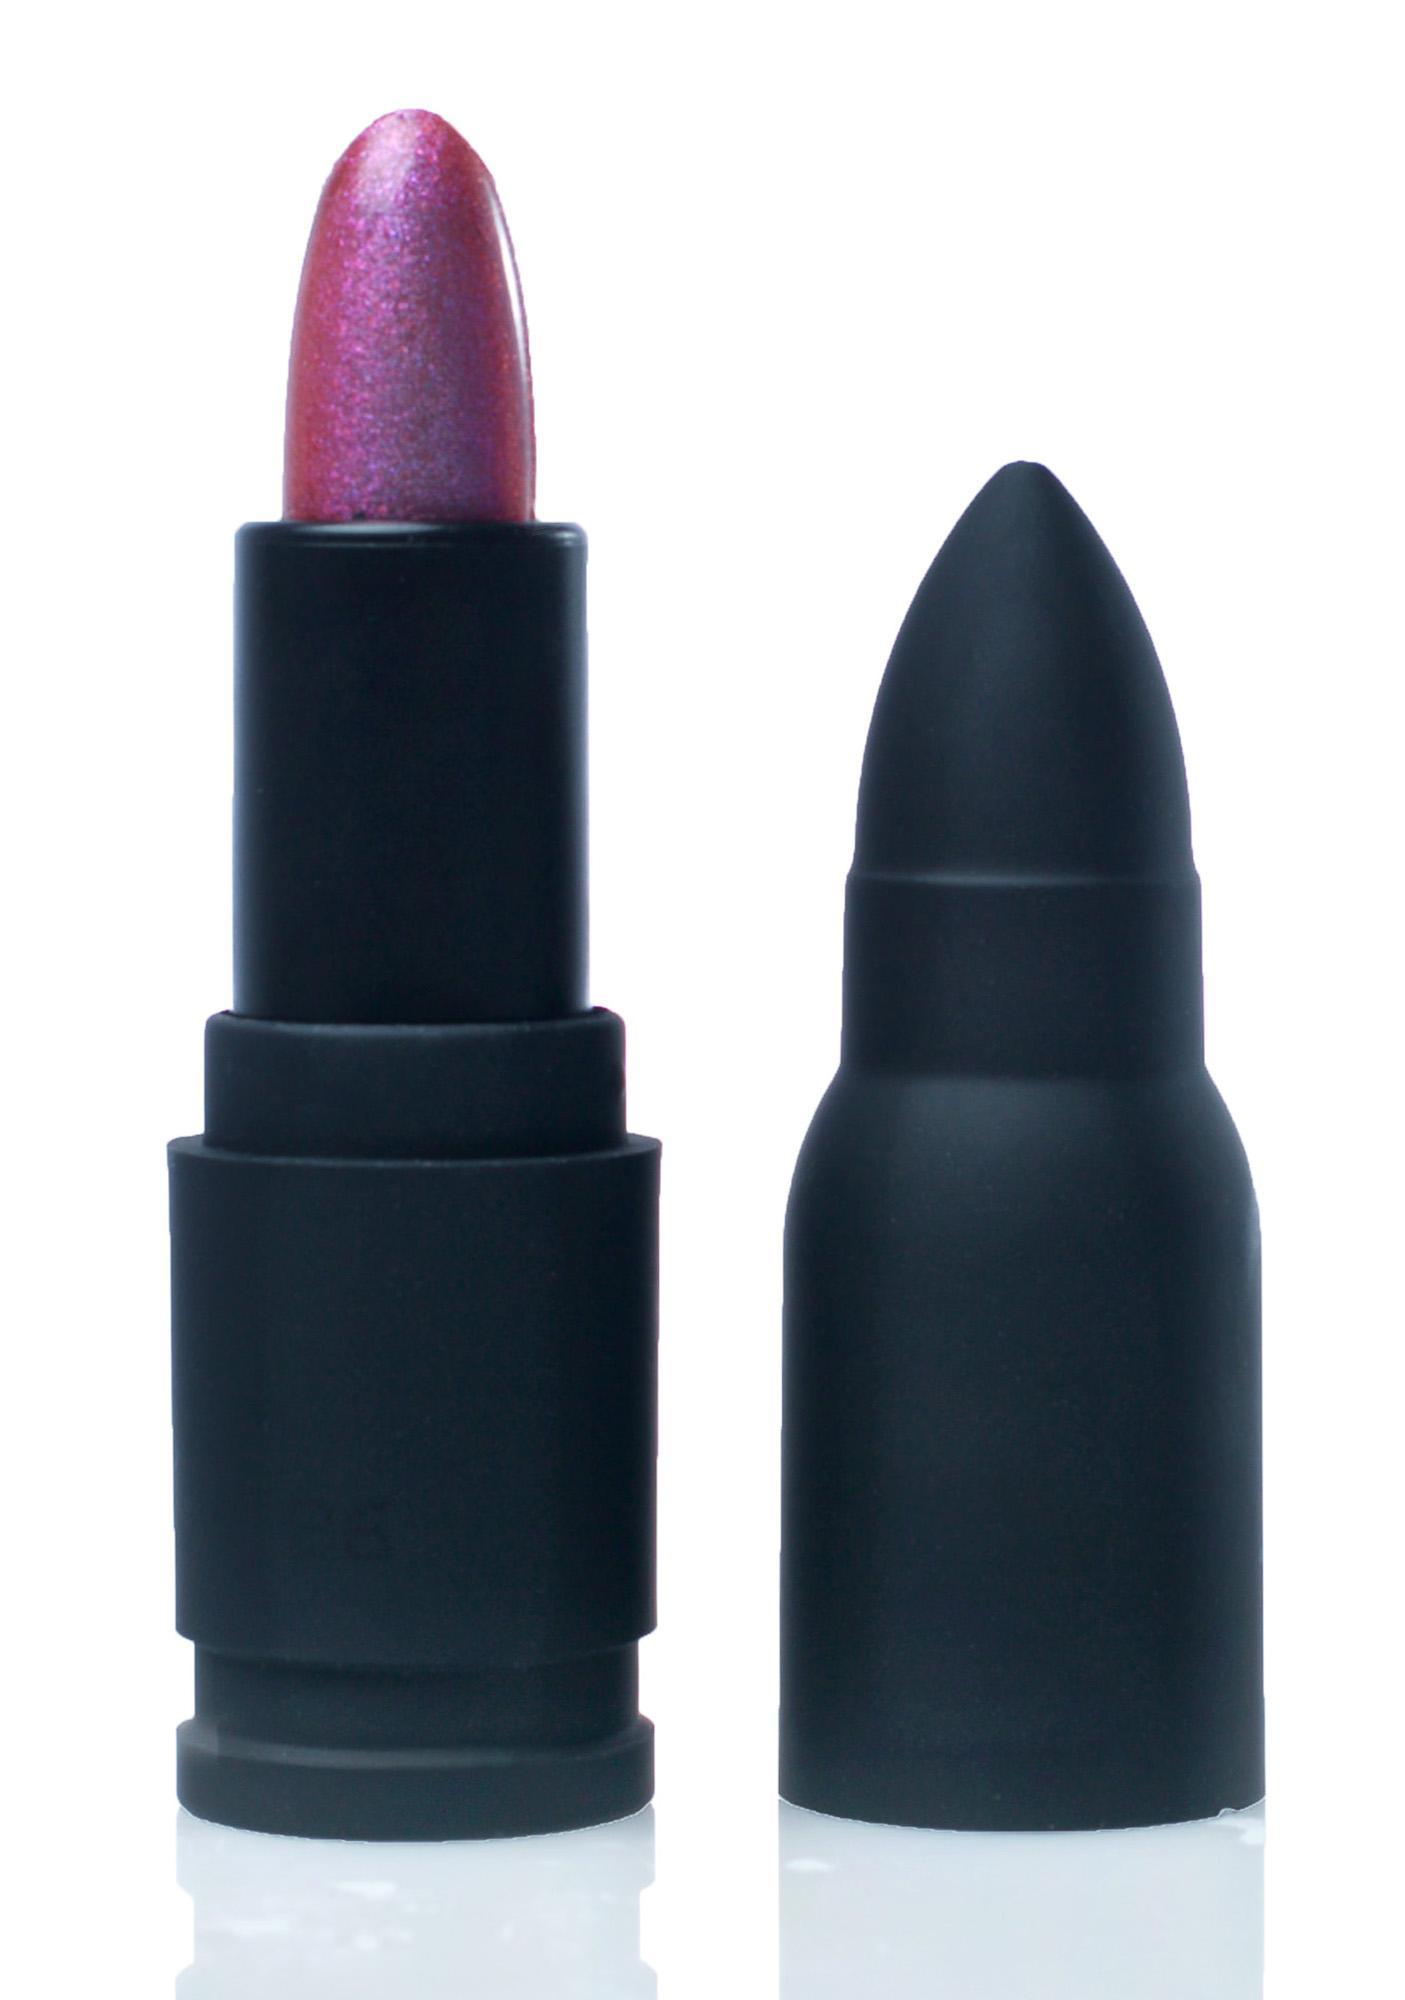 Lunatick Cosmetic Labs Lacrimosa Apocalipstick